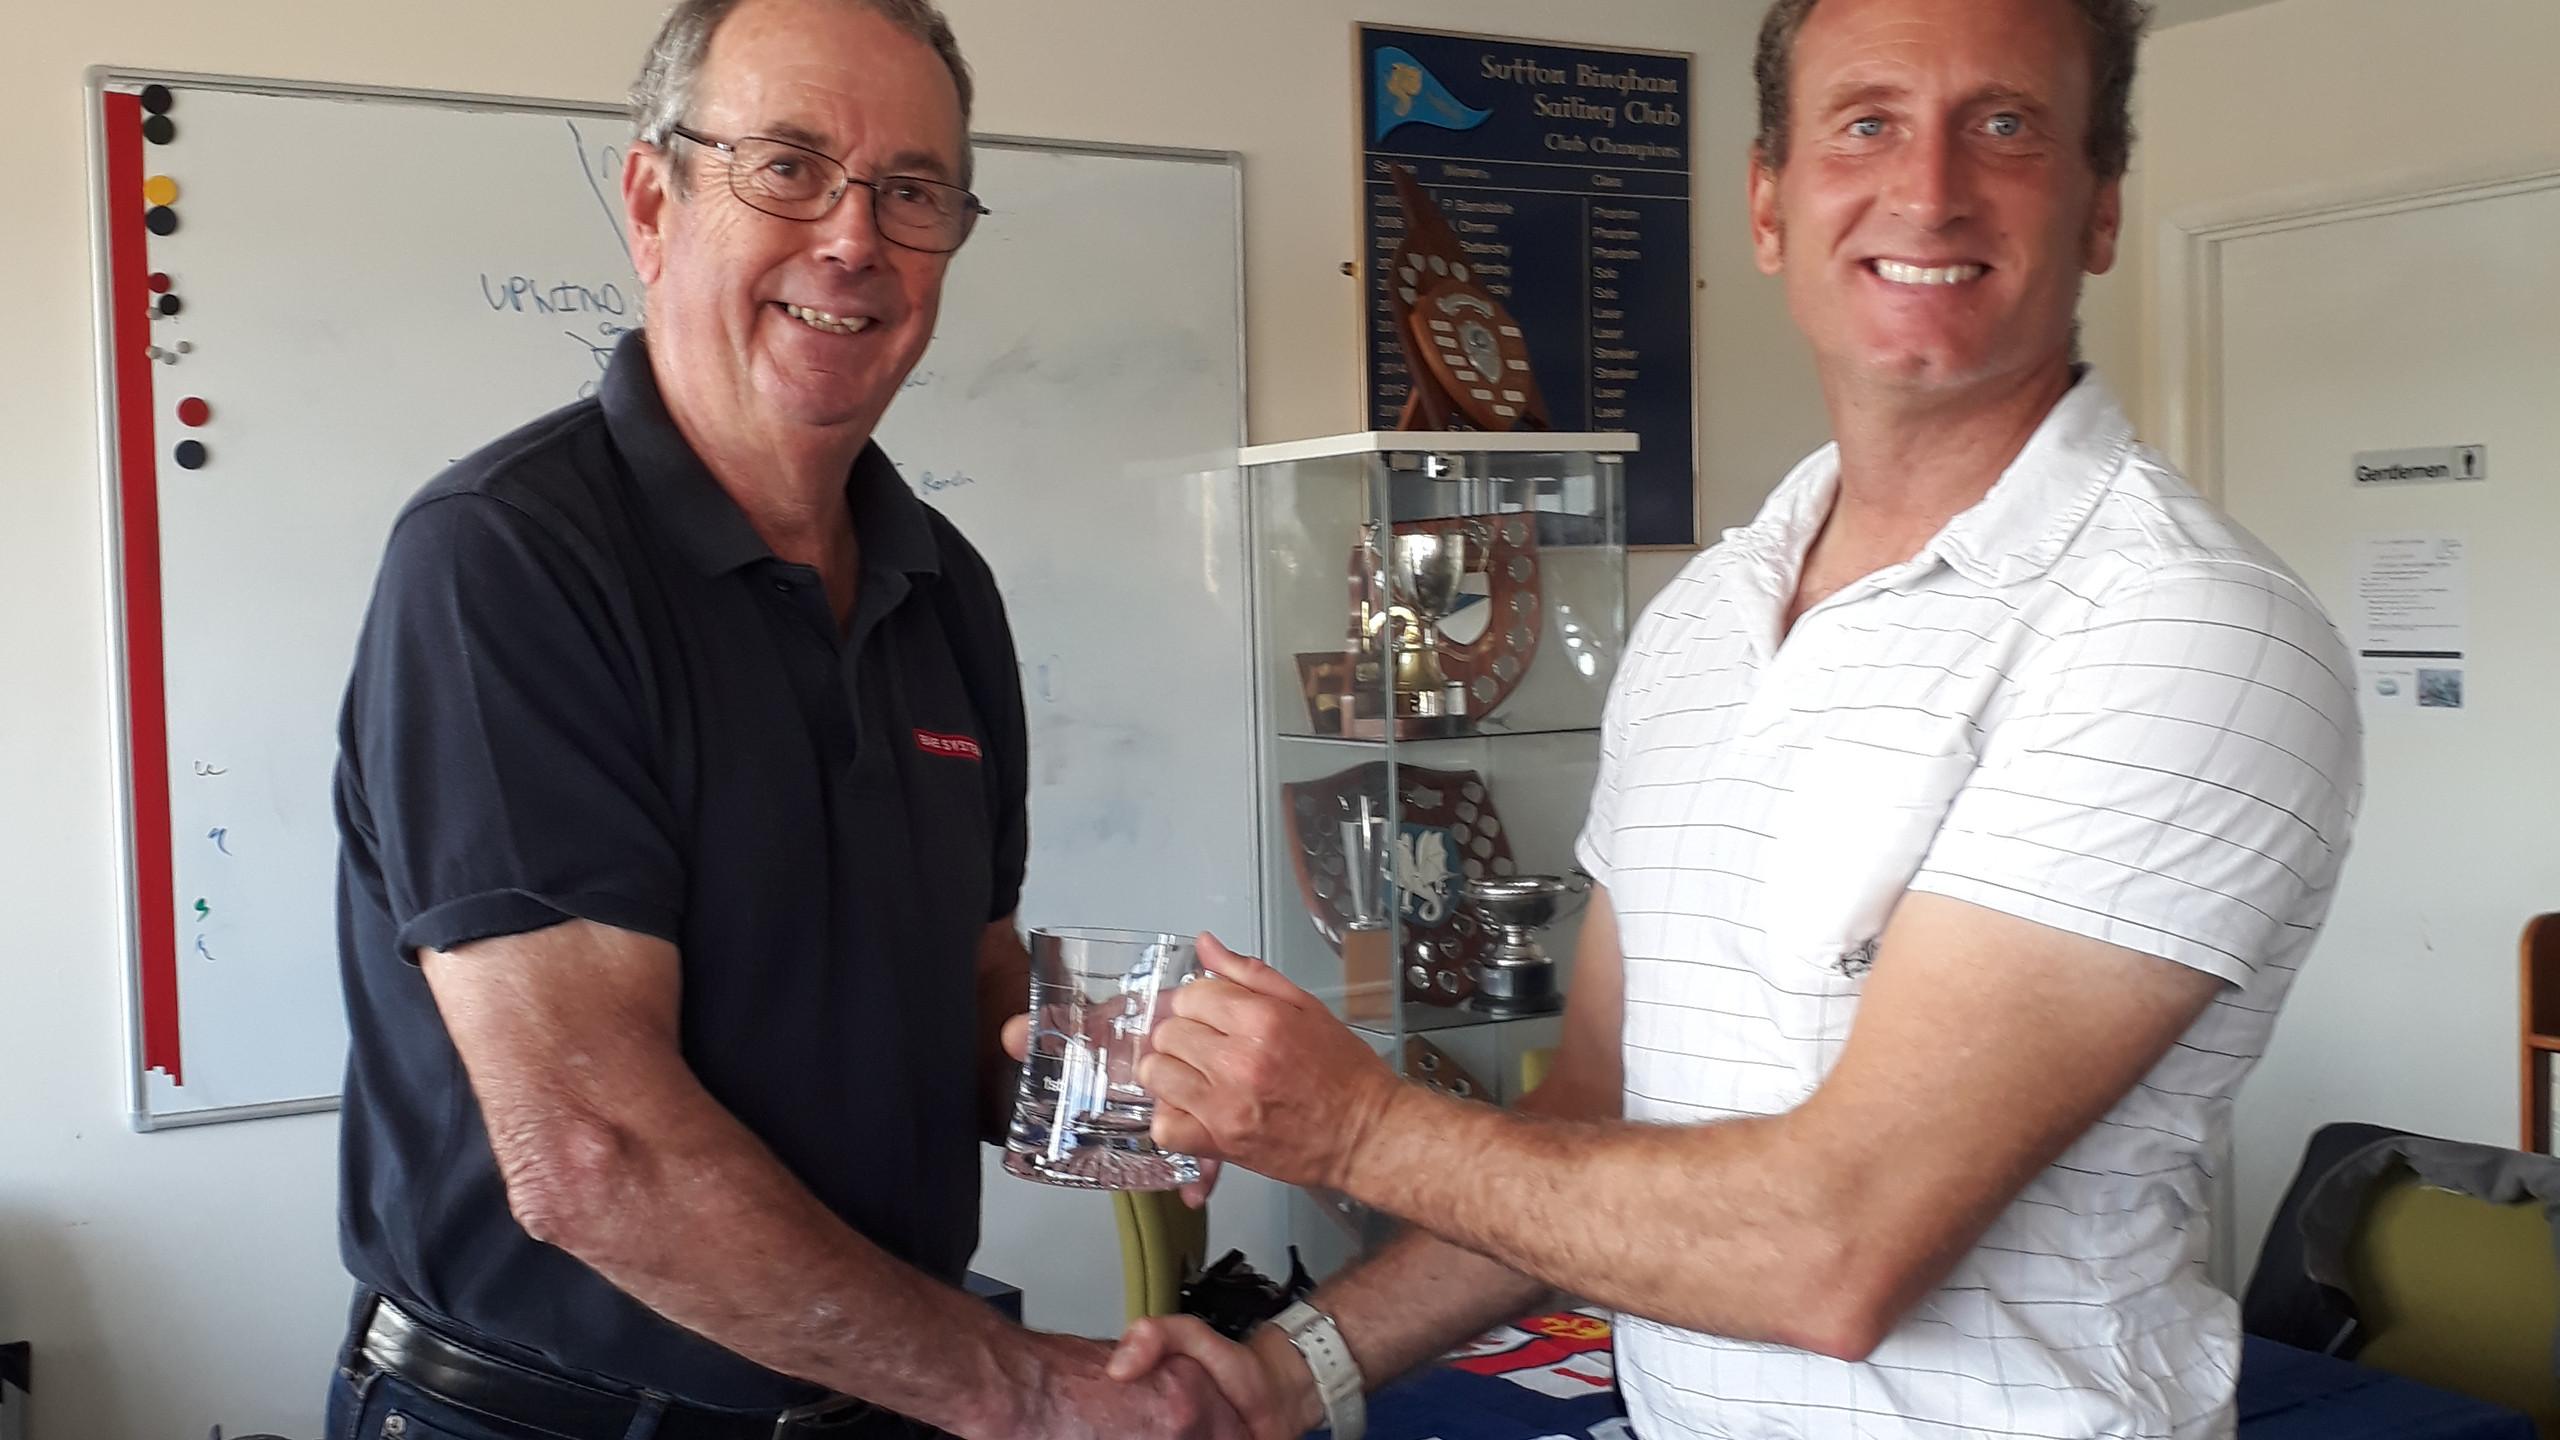 Mervyn Clark congratulates Laser Standar